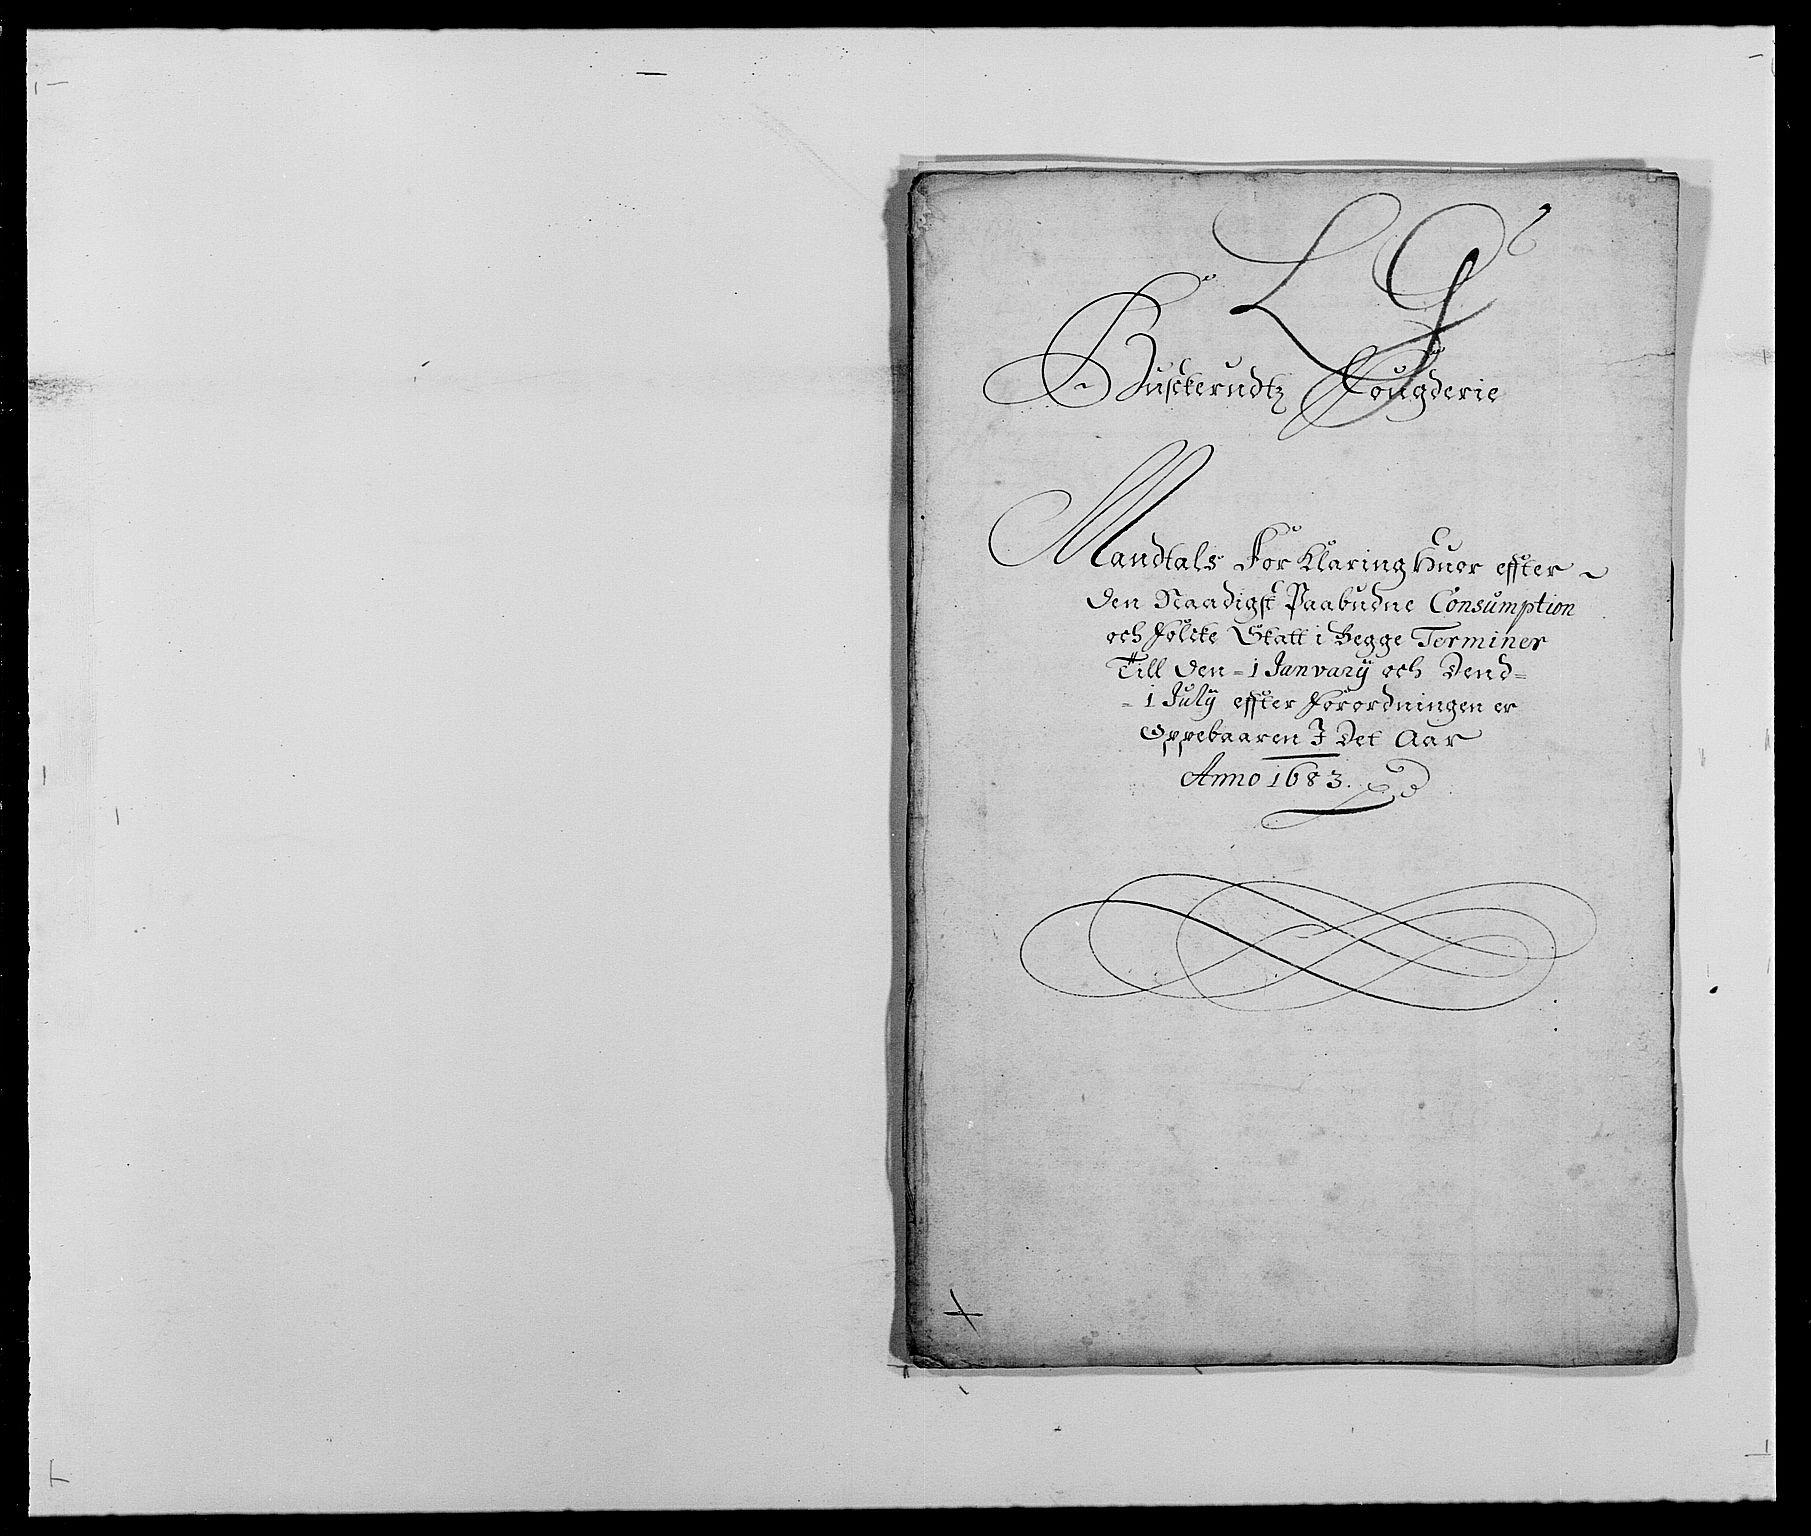 RA, Rentekammeret inntil 1814, Reviderte regnskaper, Fogderegnskap, R25/L1677: Fogderegnskap Buskerud, 1683-1684, s. 136